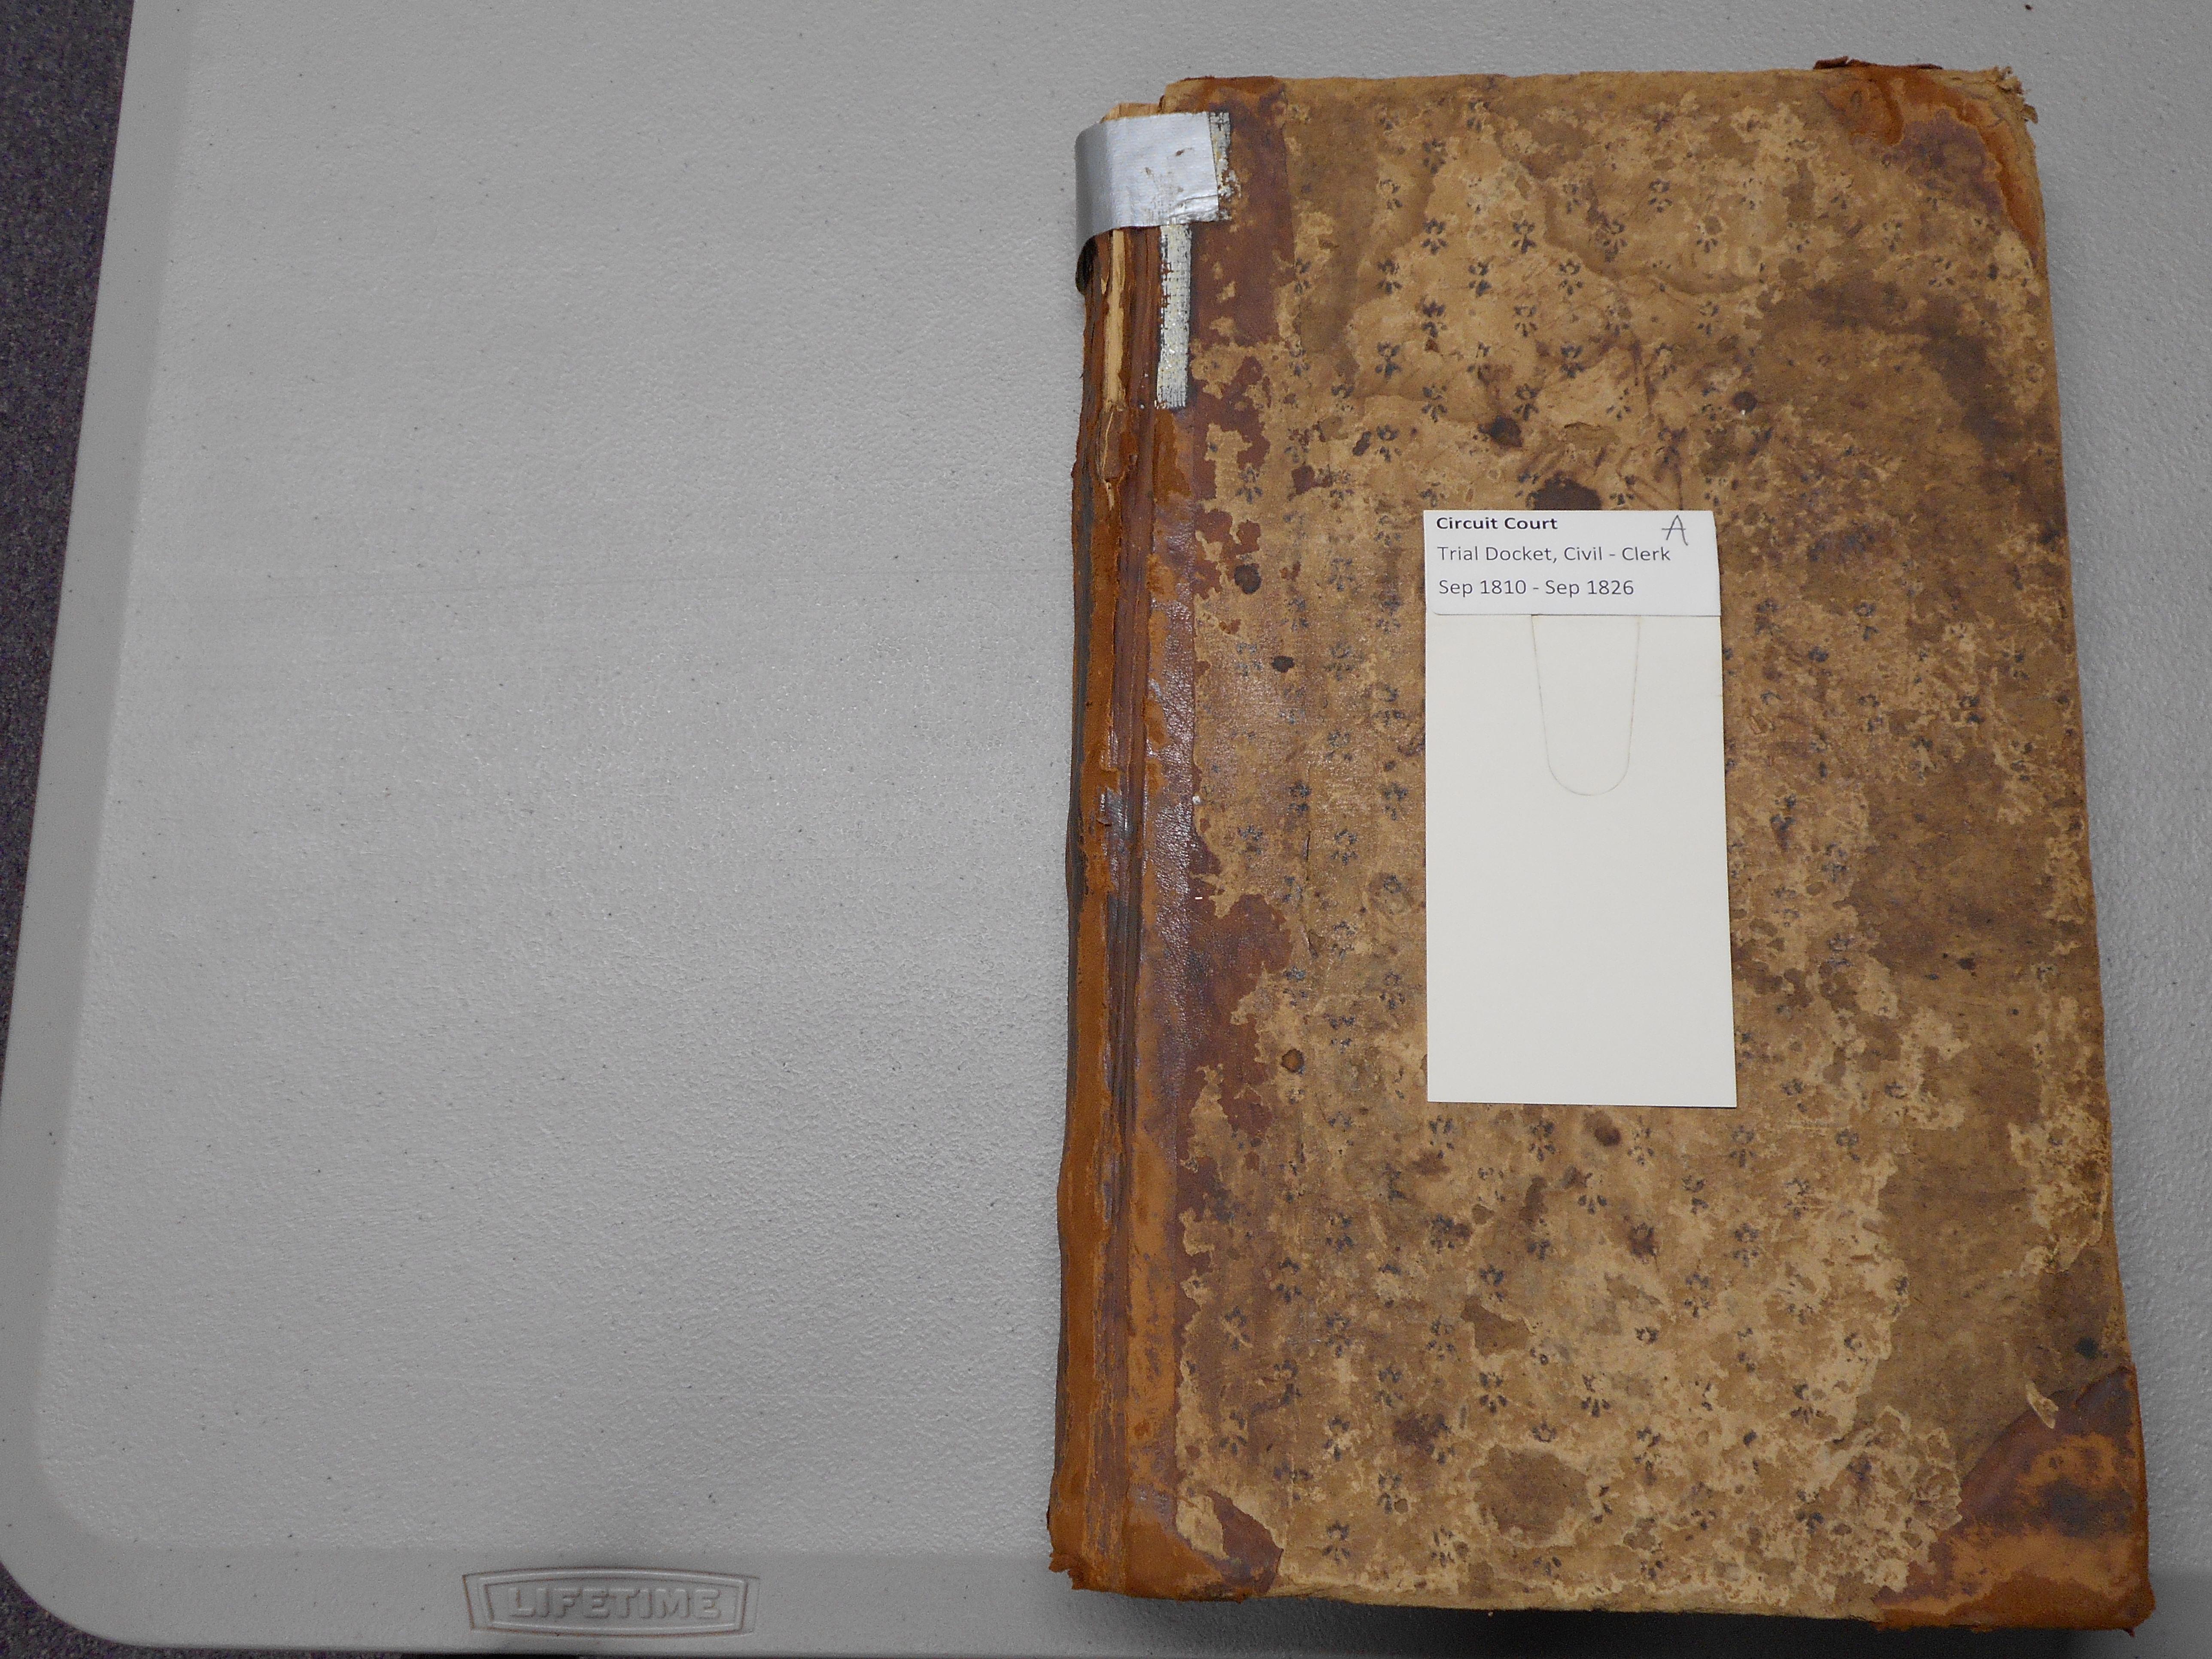 Circuit Court Trial Docket, 1810-1826